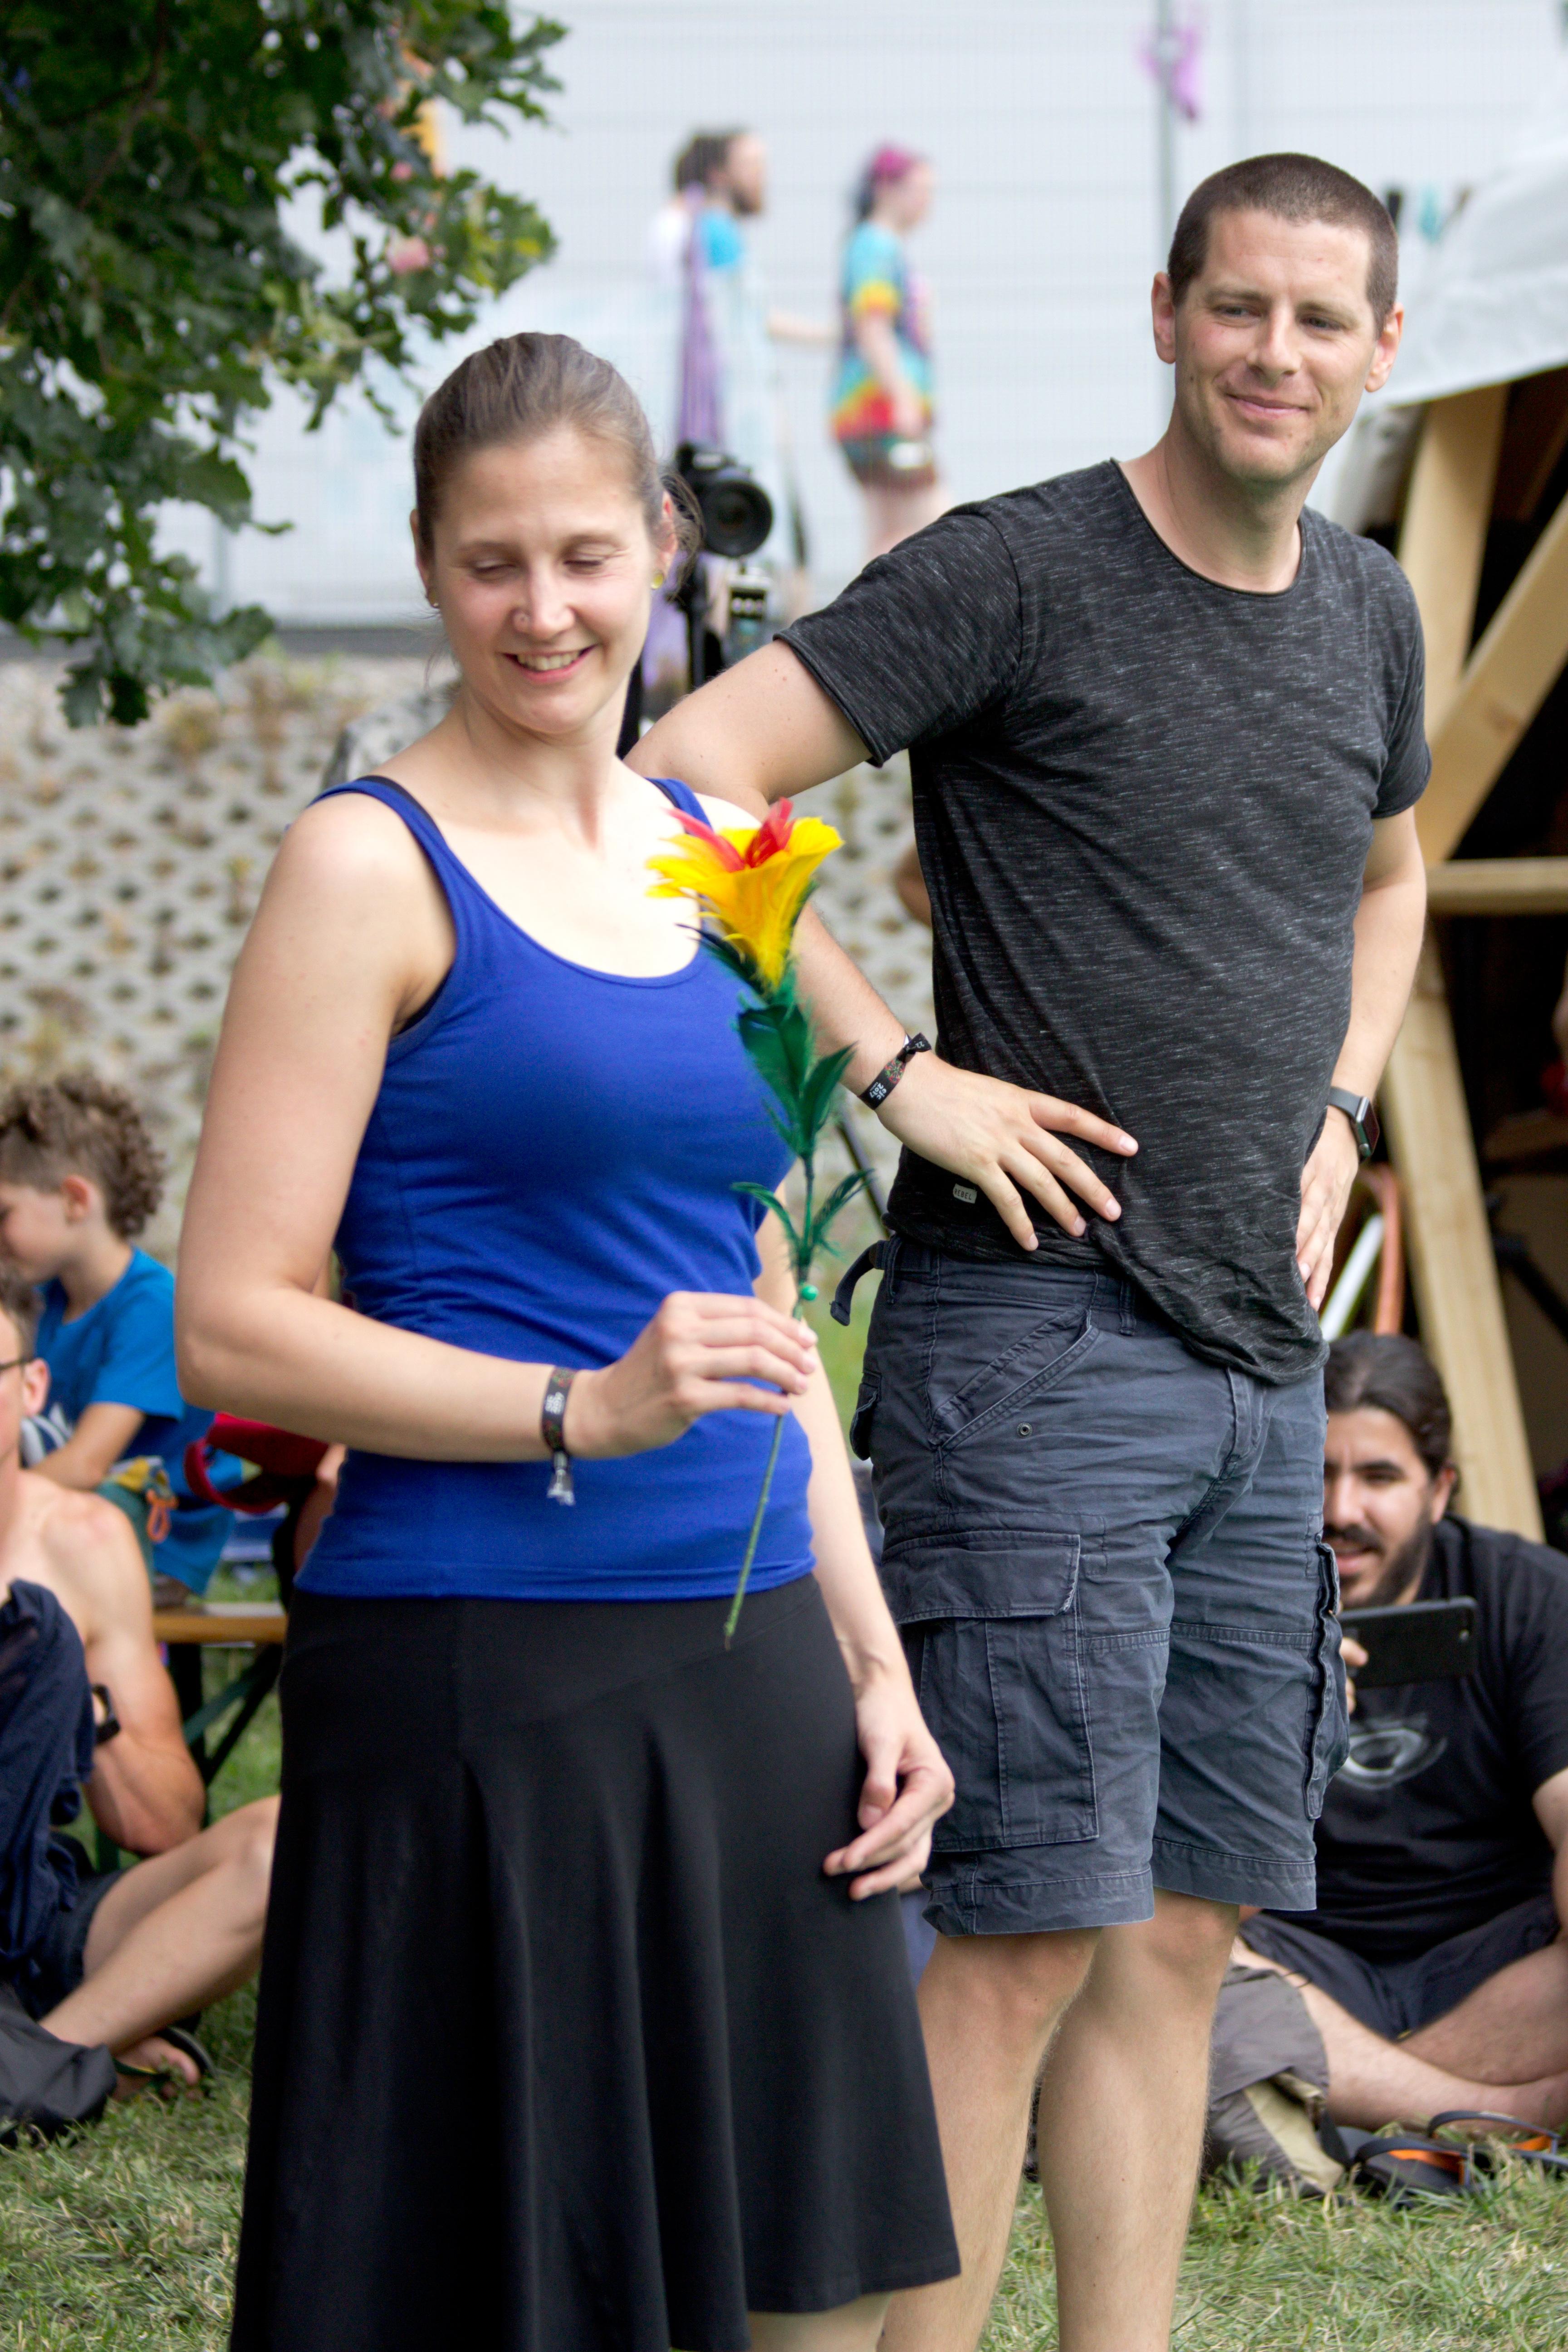 EJC 2017 Lublin Day 6: Cafe Cabaret Show.